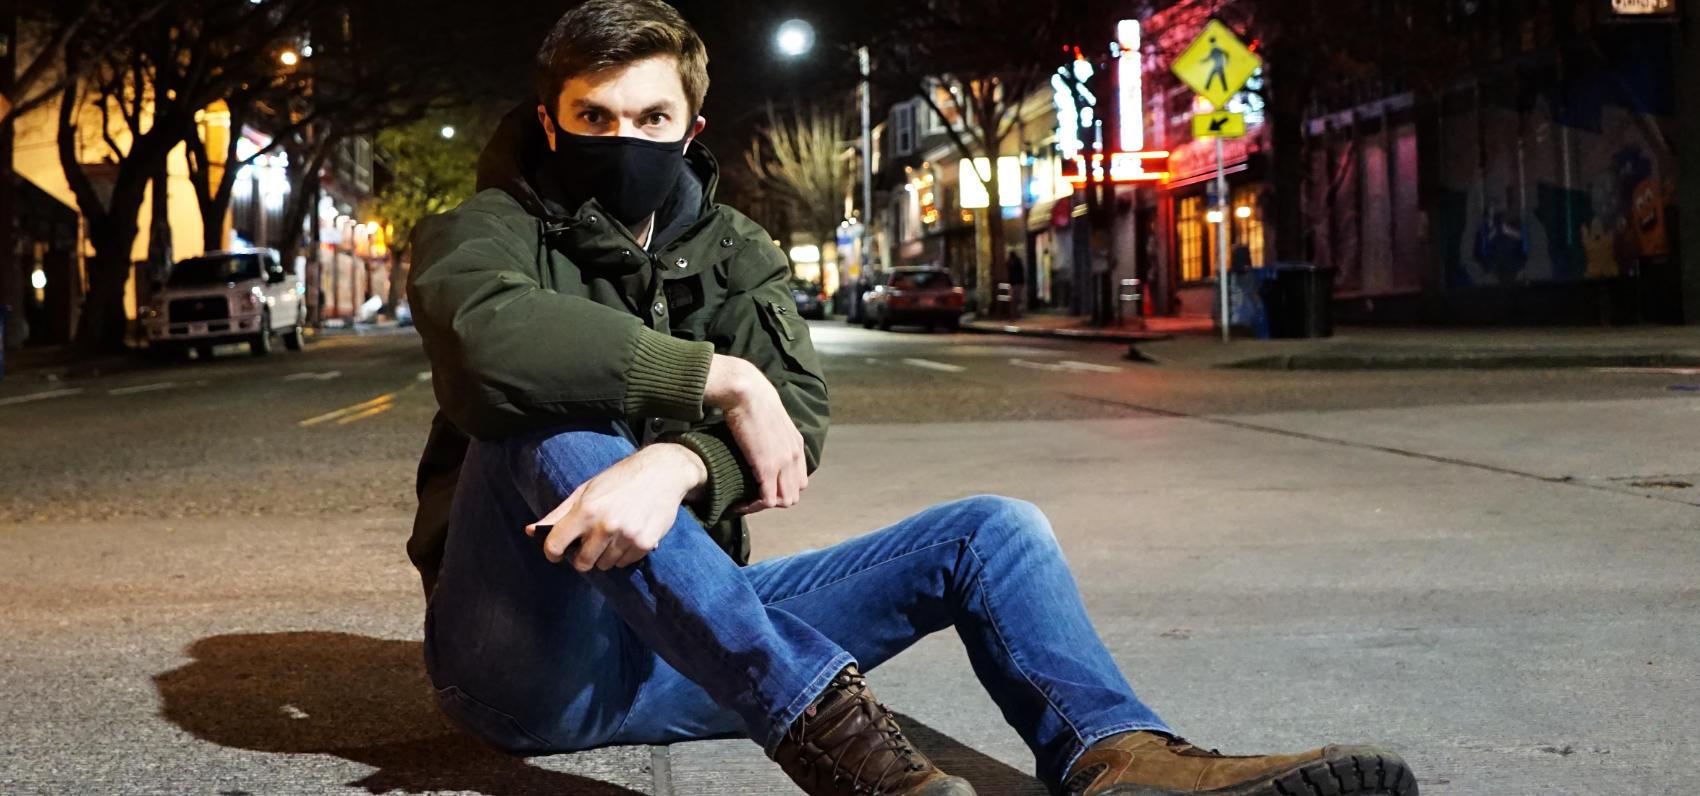 A photograph of Gaelan Lloyd sitting in a deserted street at night